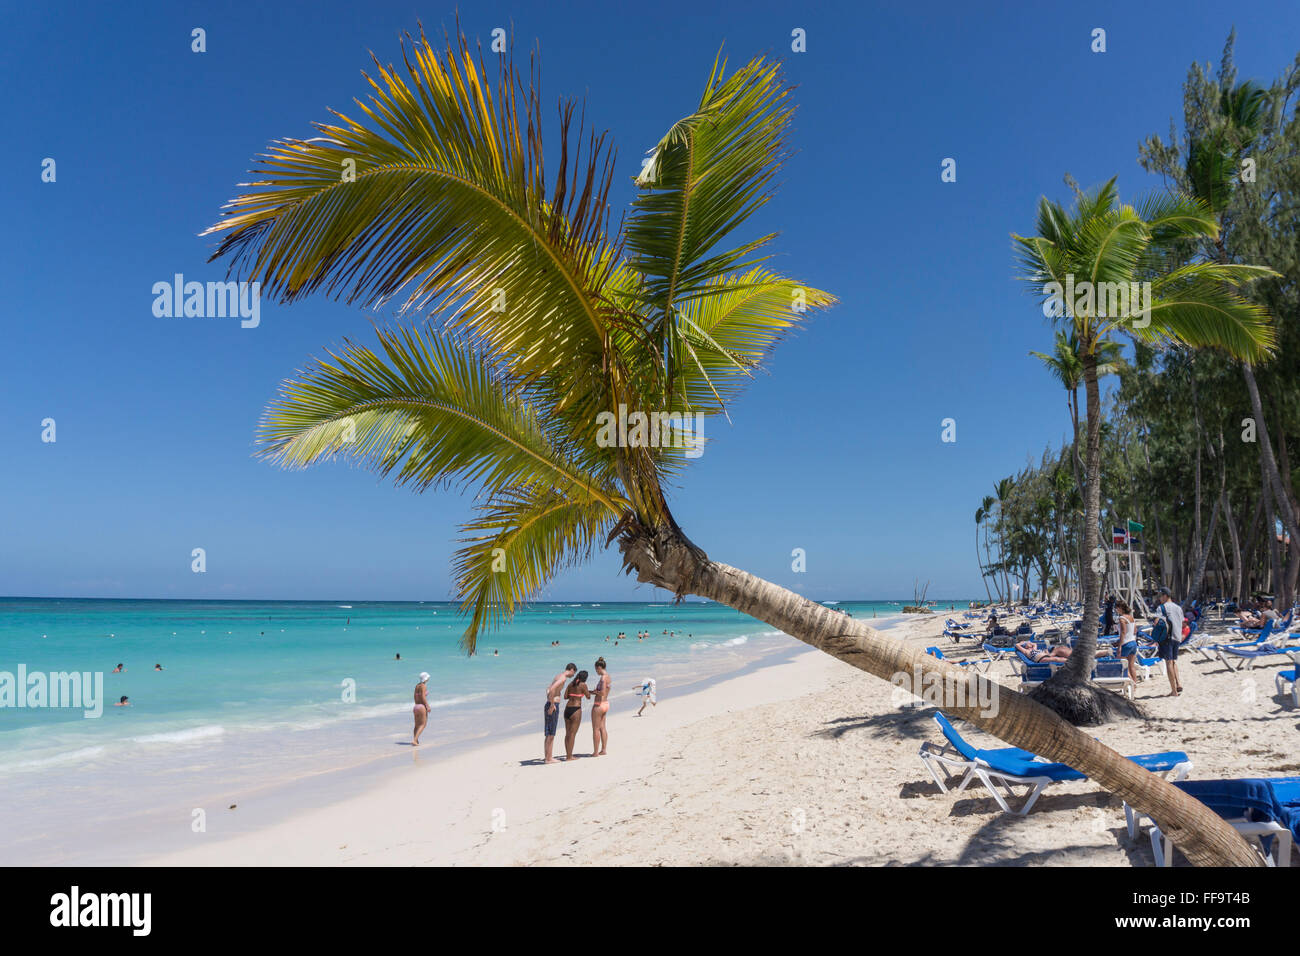 Palm Beach, Playa Bavaro, Punta Cana, Repubblica Dominicana, dei Caraibi Immagini Stock